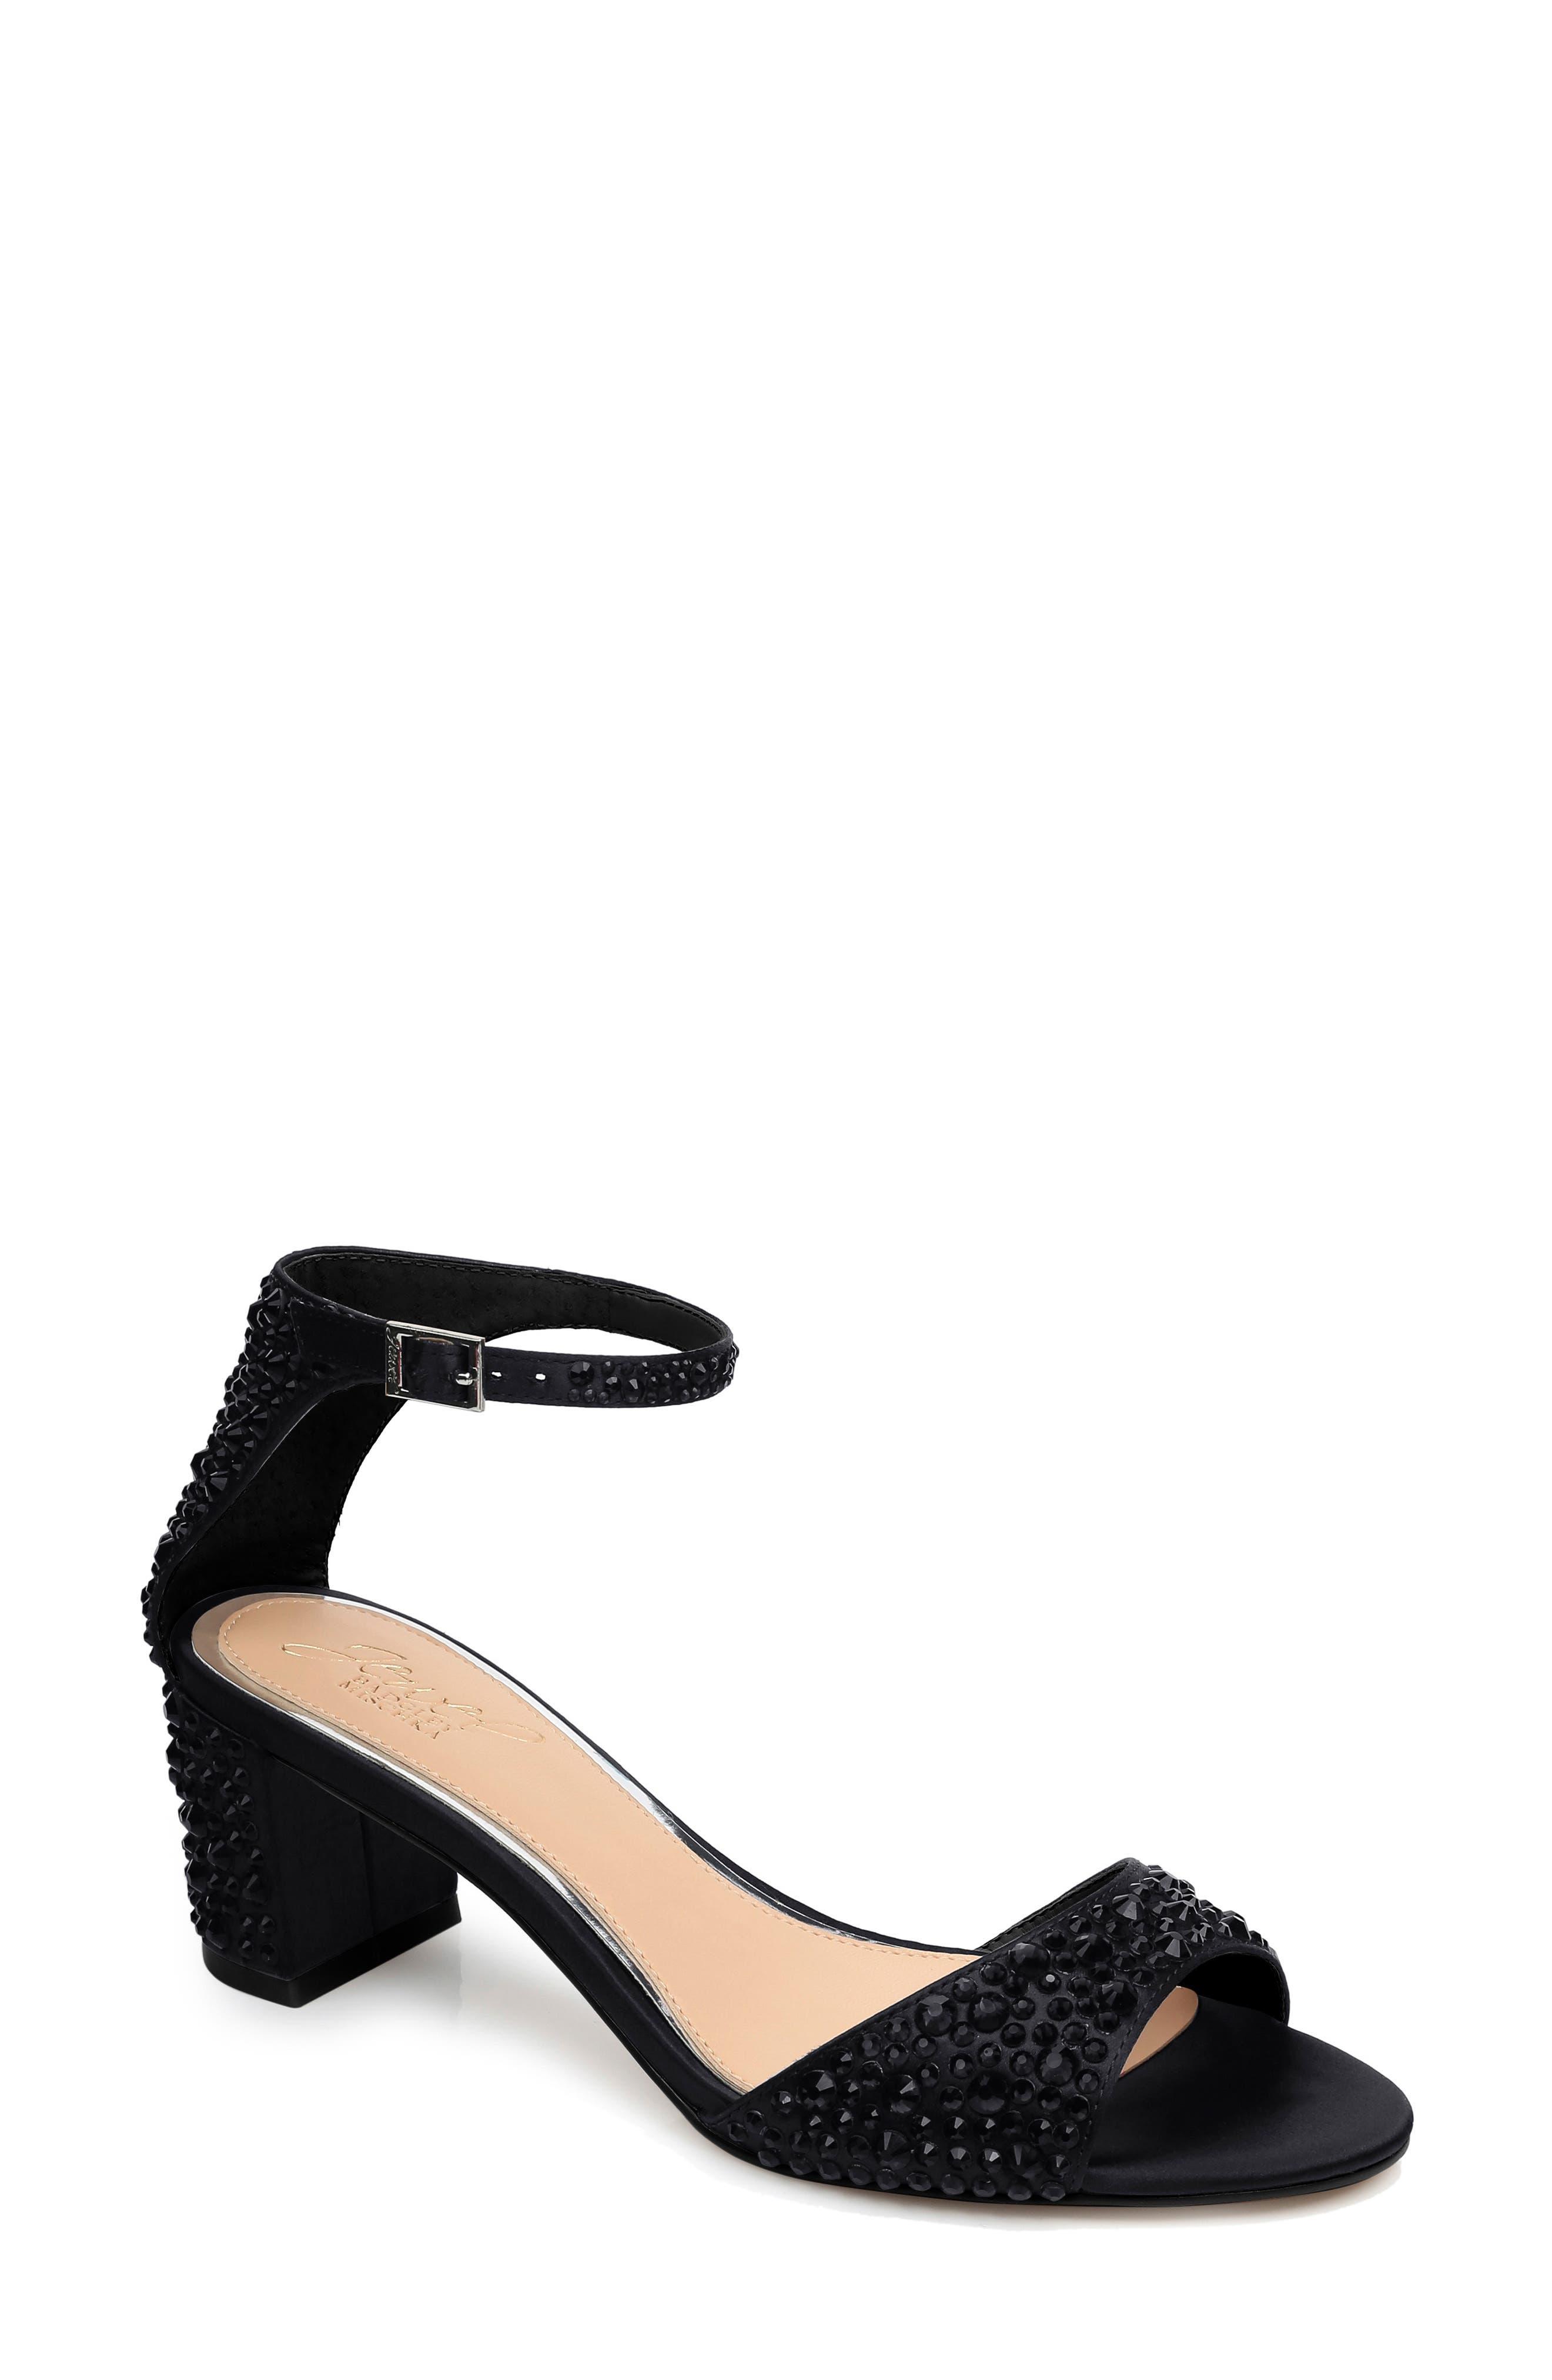 JEWEL BADGLEY MISCHKA Crystal Block Heel Sandal, Main, color, BLACK CRYSTAL SATIN